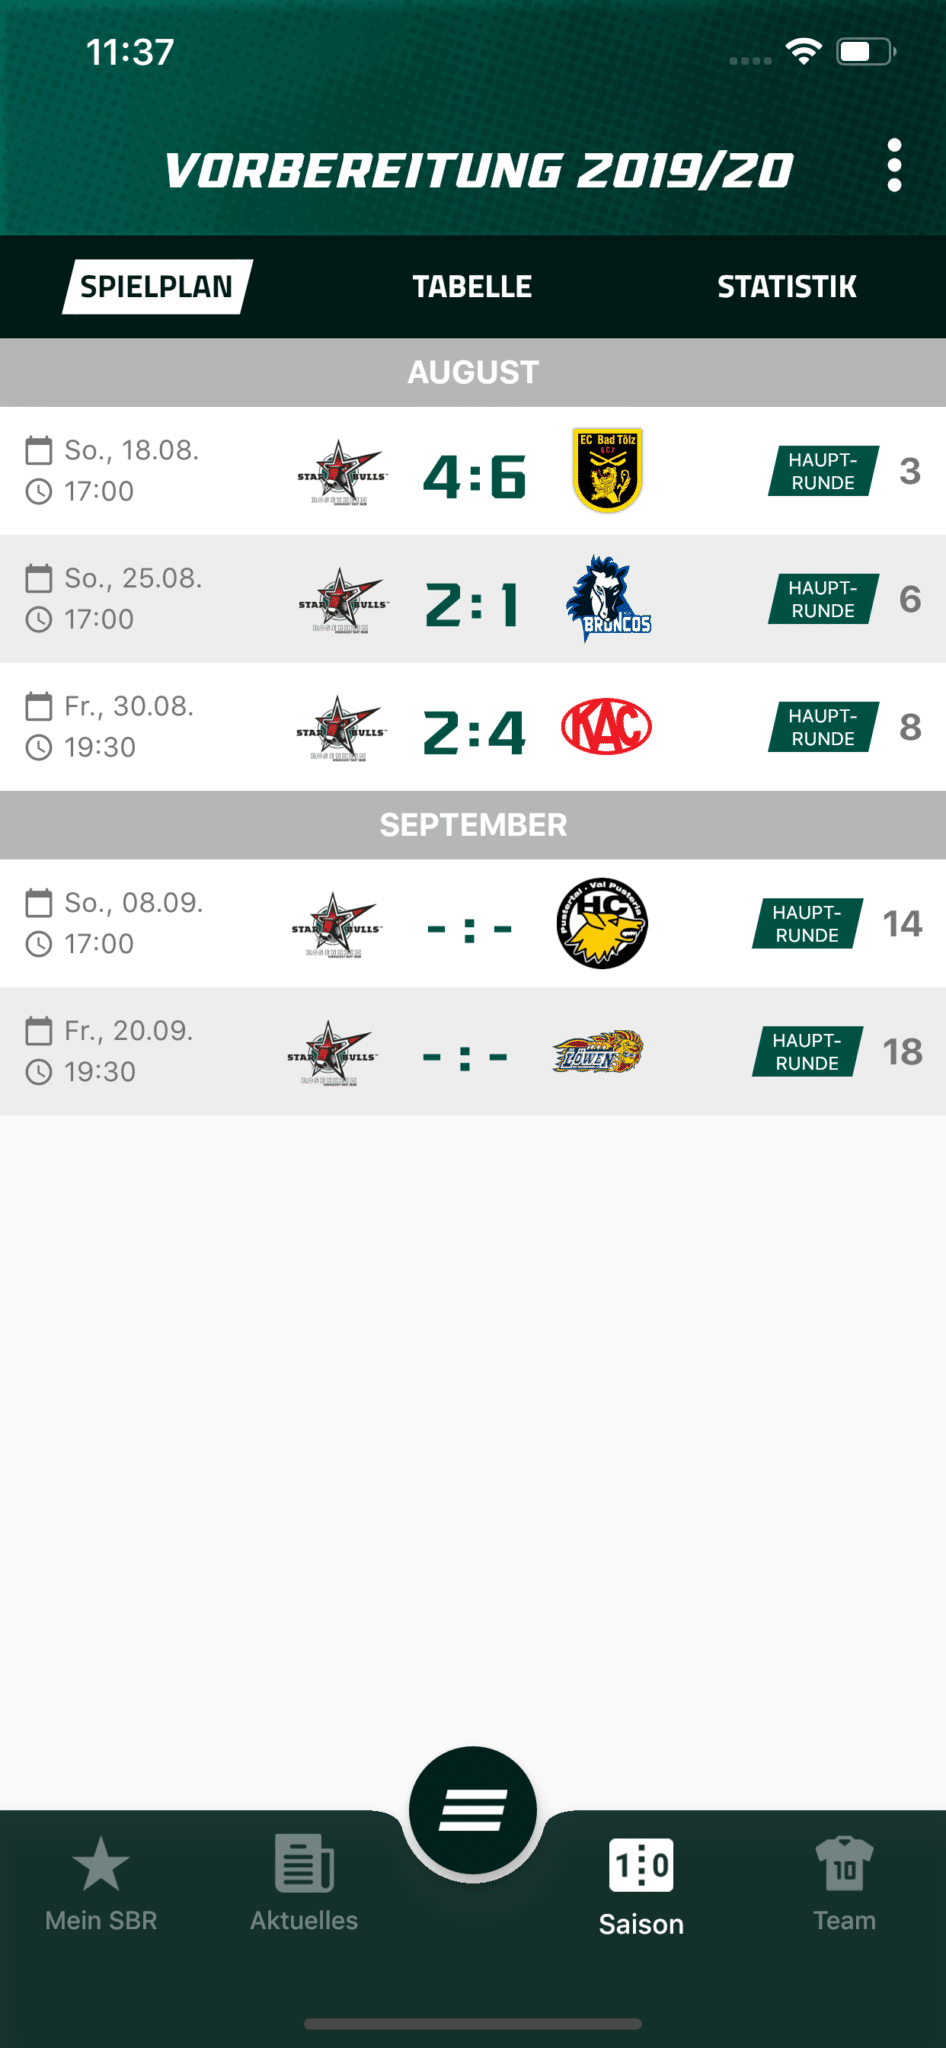 Eishockey Tabelle